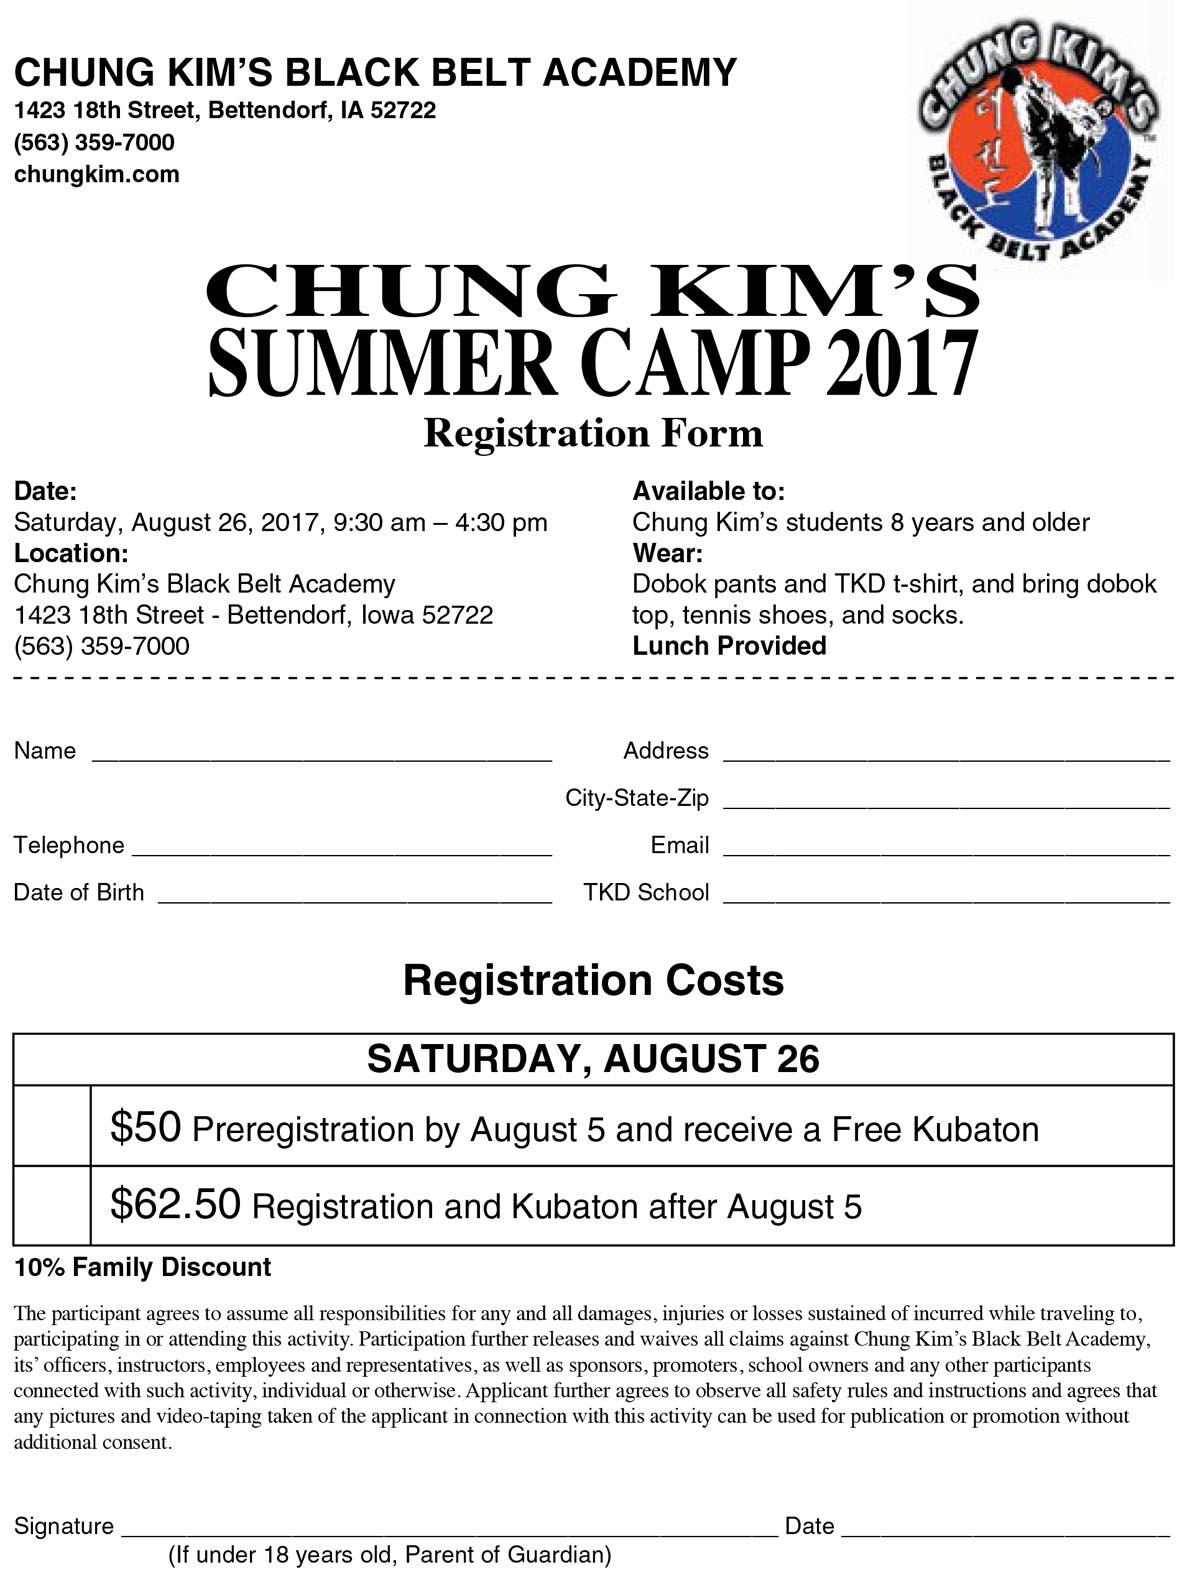 chung kim's summer camp